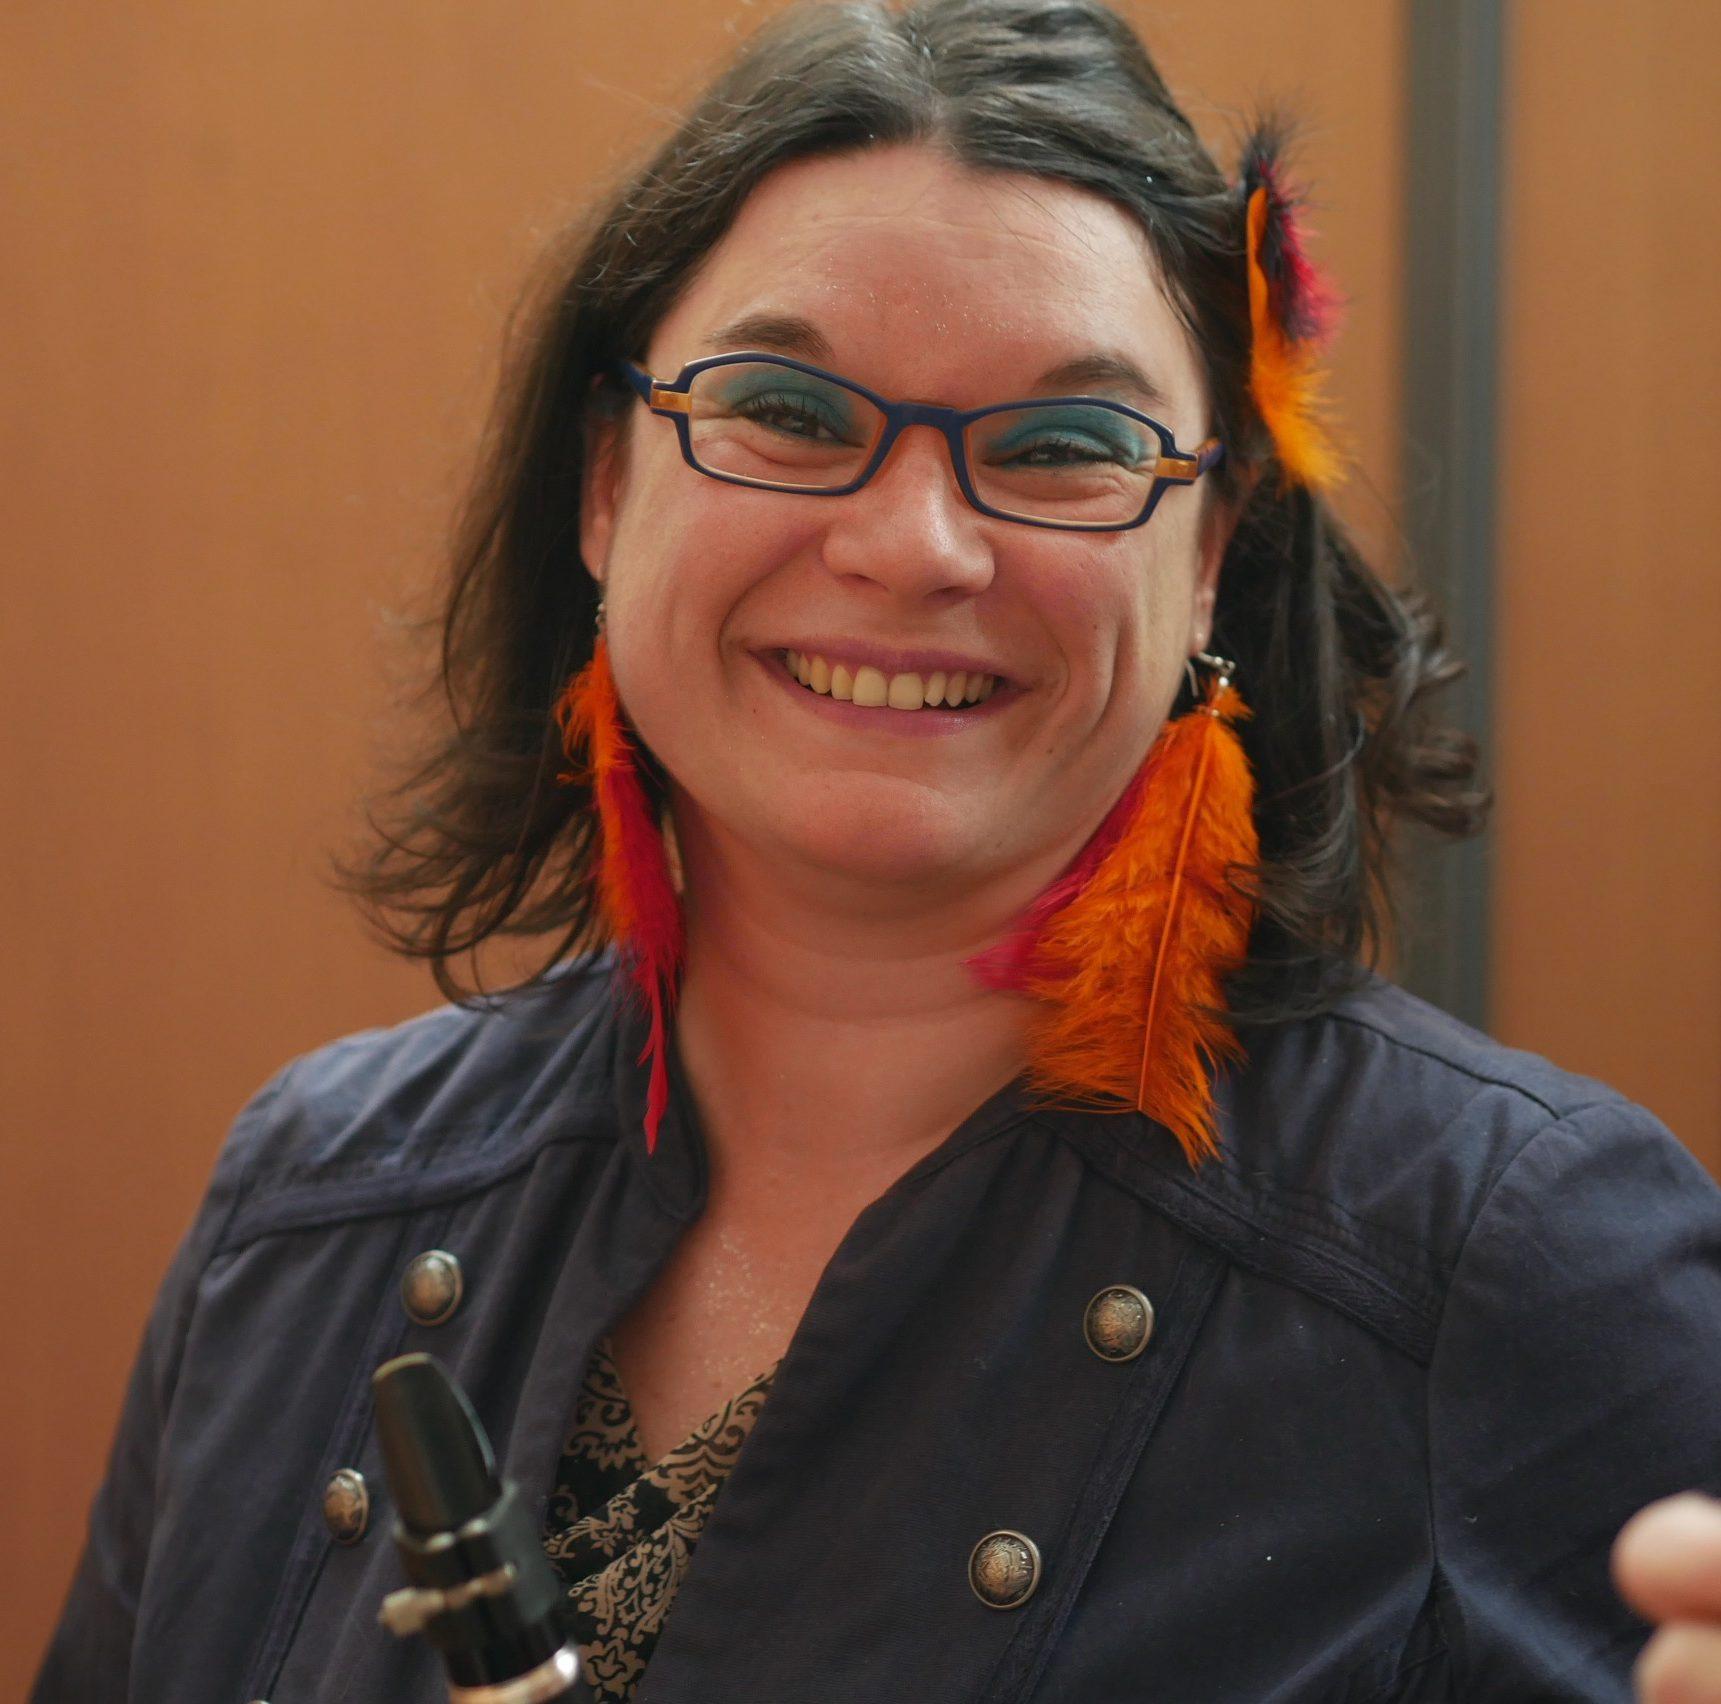 Hélène Gault